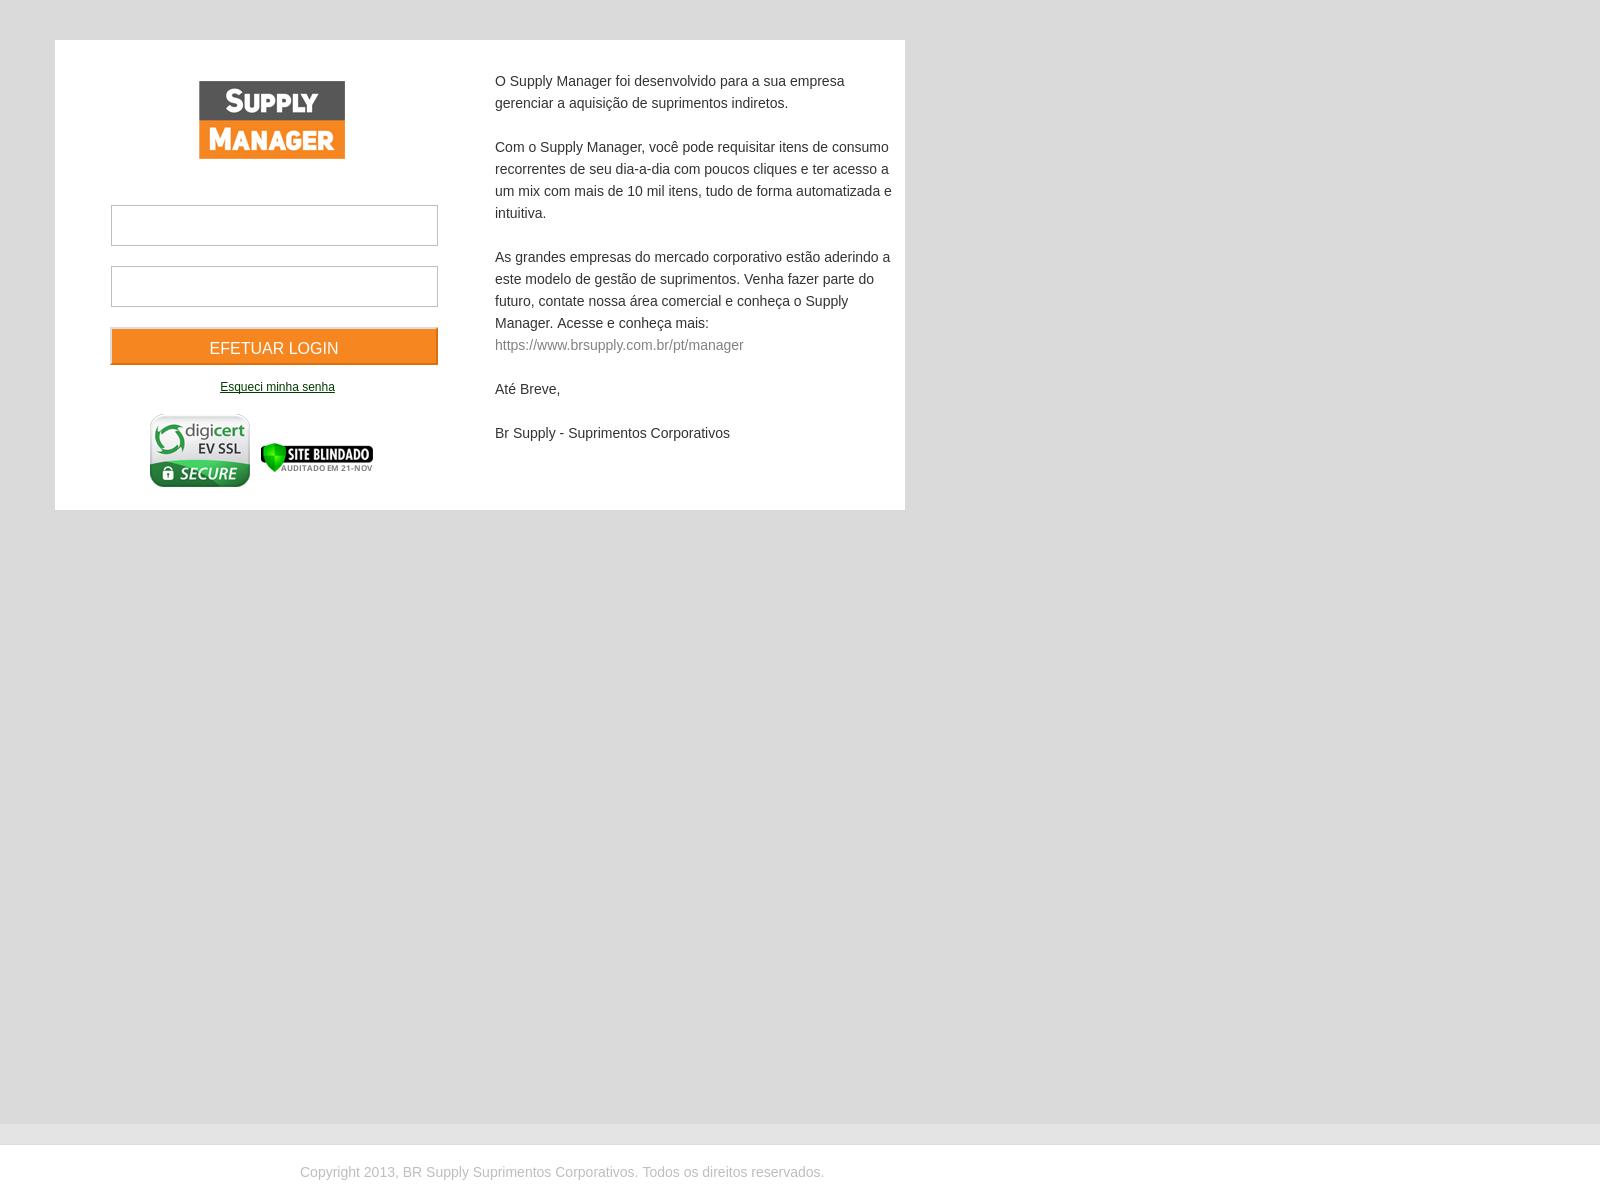 newmanager.brsupply.com.br - urlscan.io 104c4d013f